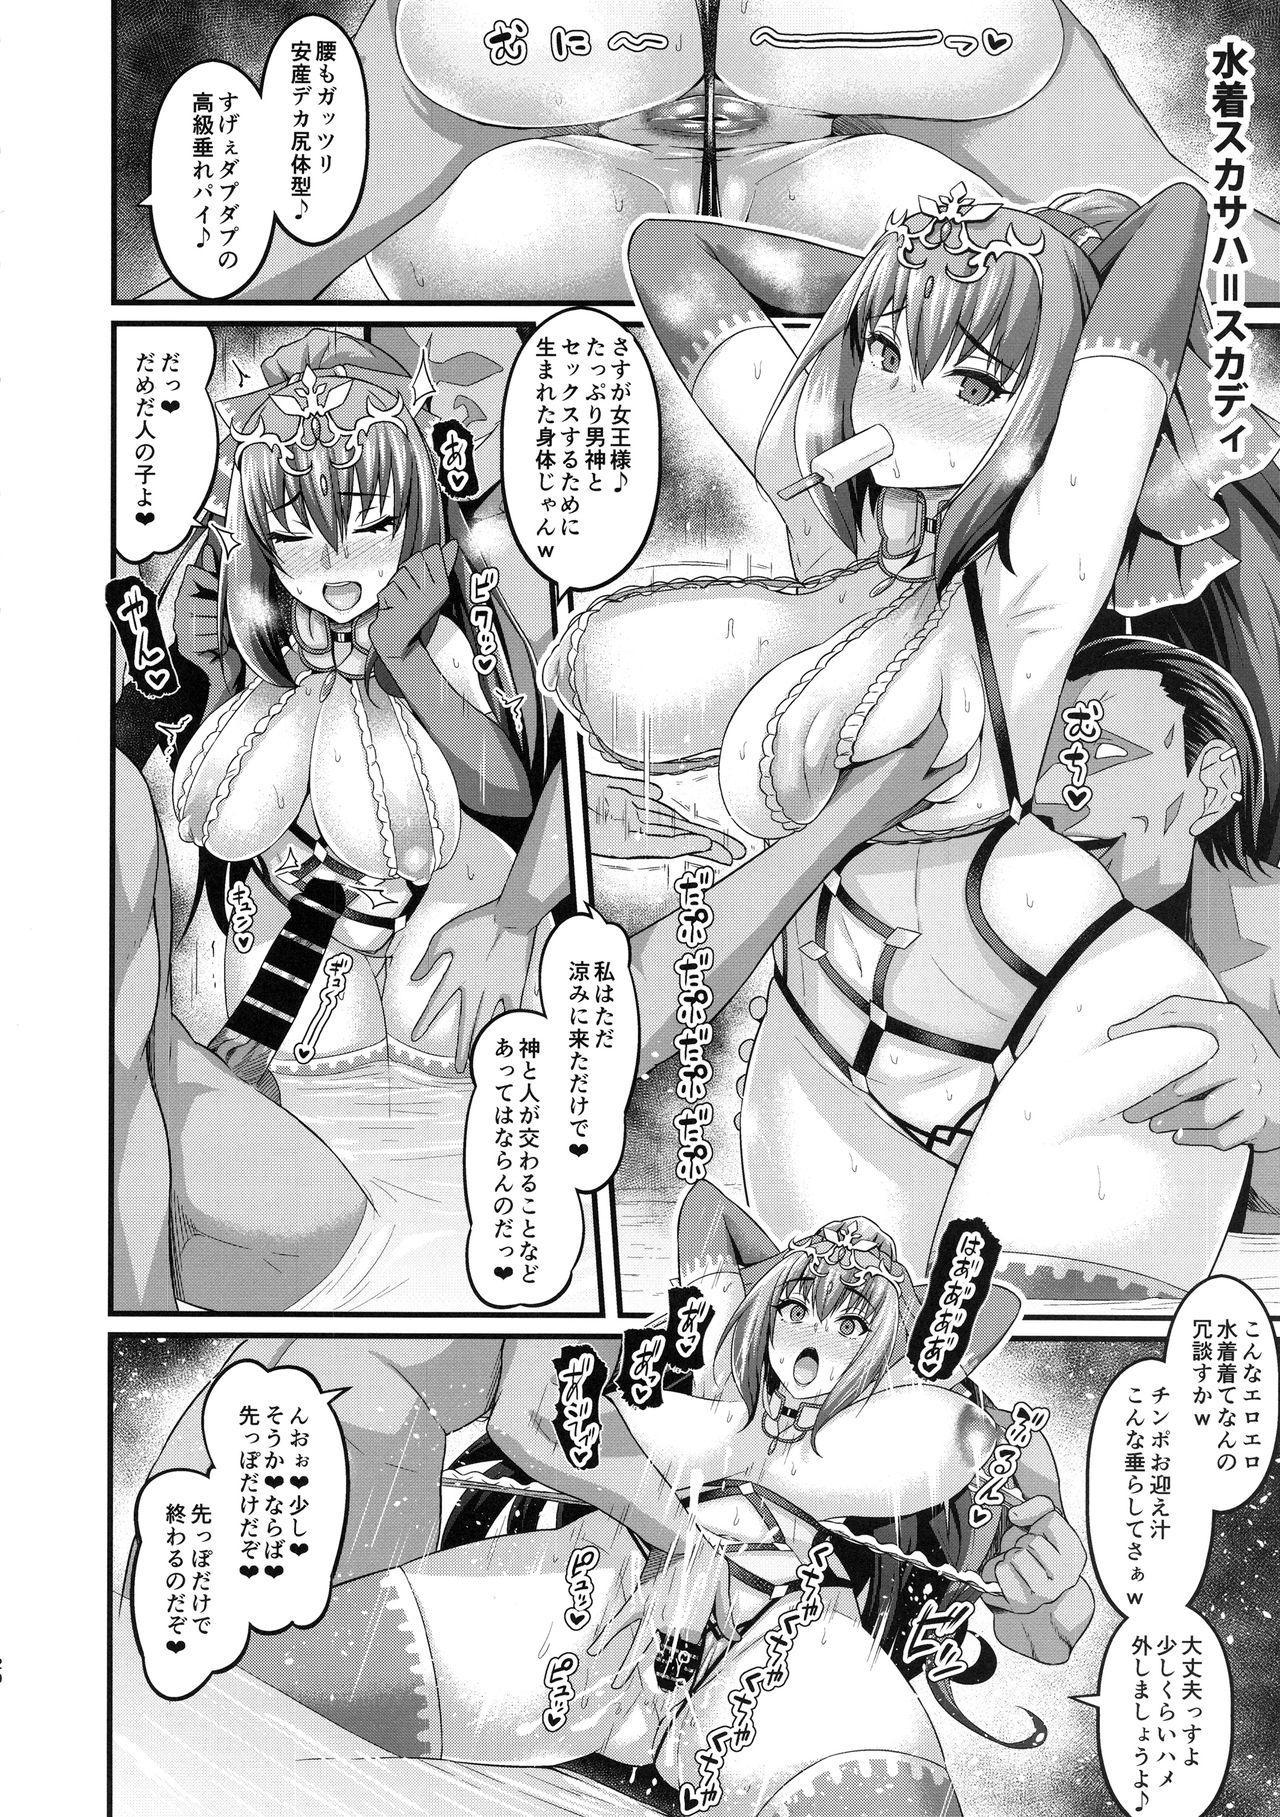 Las Vegas Bitch Kengou Sex Nanairo Shoubu 18